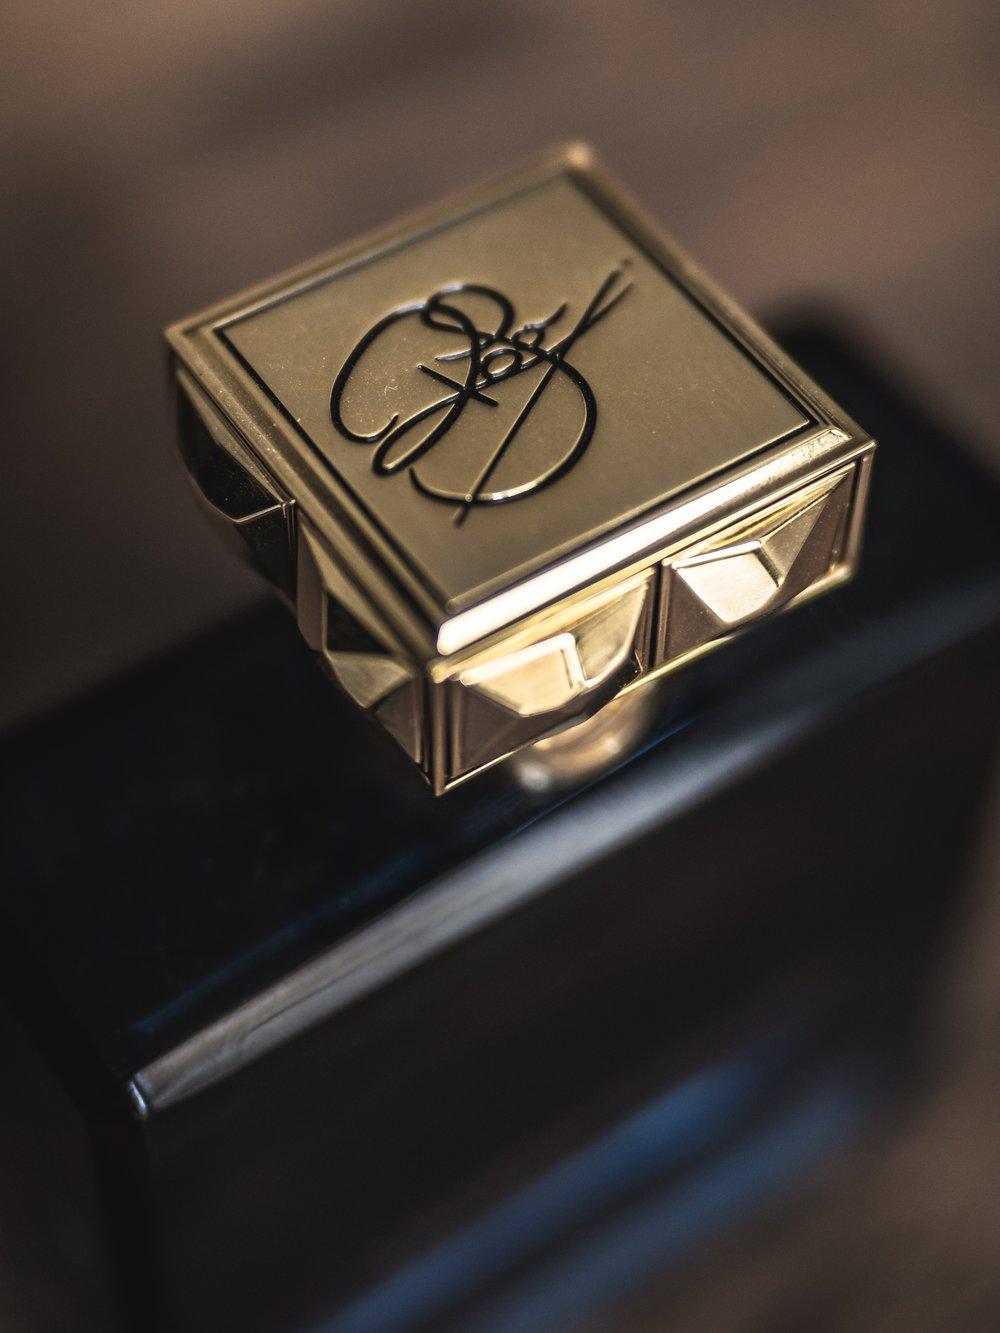 Elysium by Roja Dove Parfums Parfum Cologne Fragrance Review